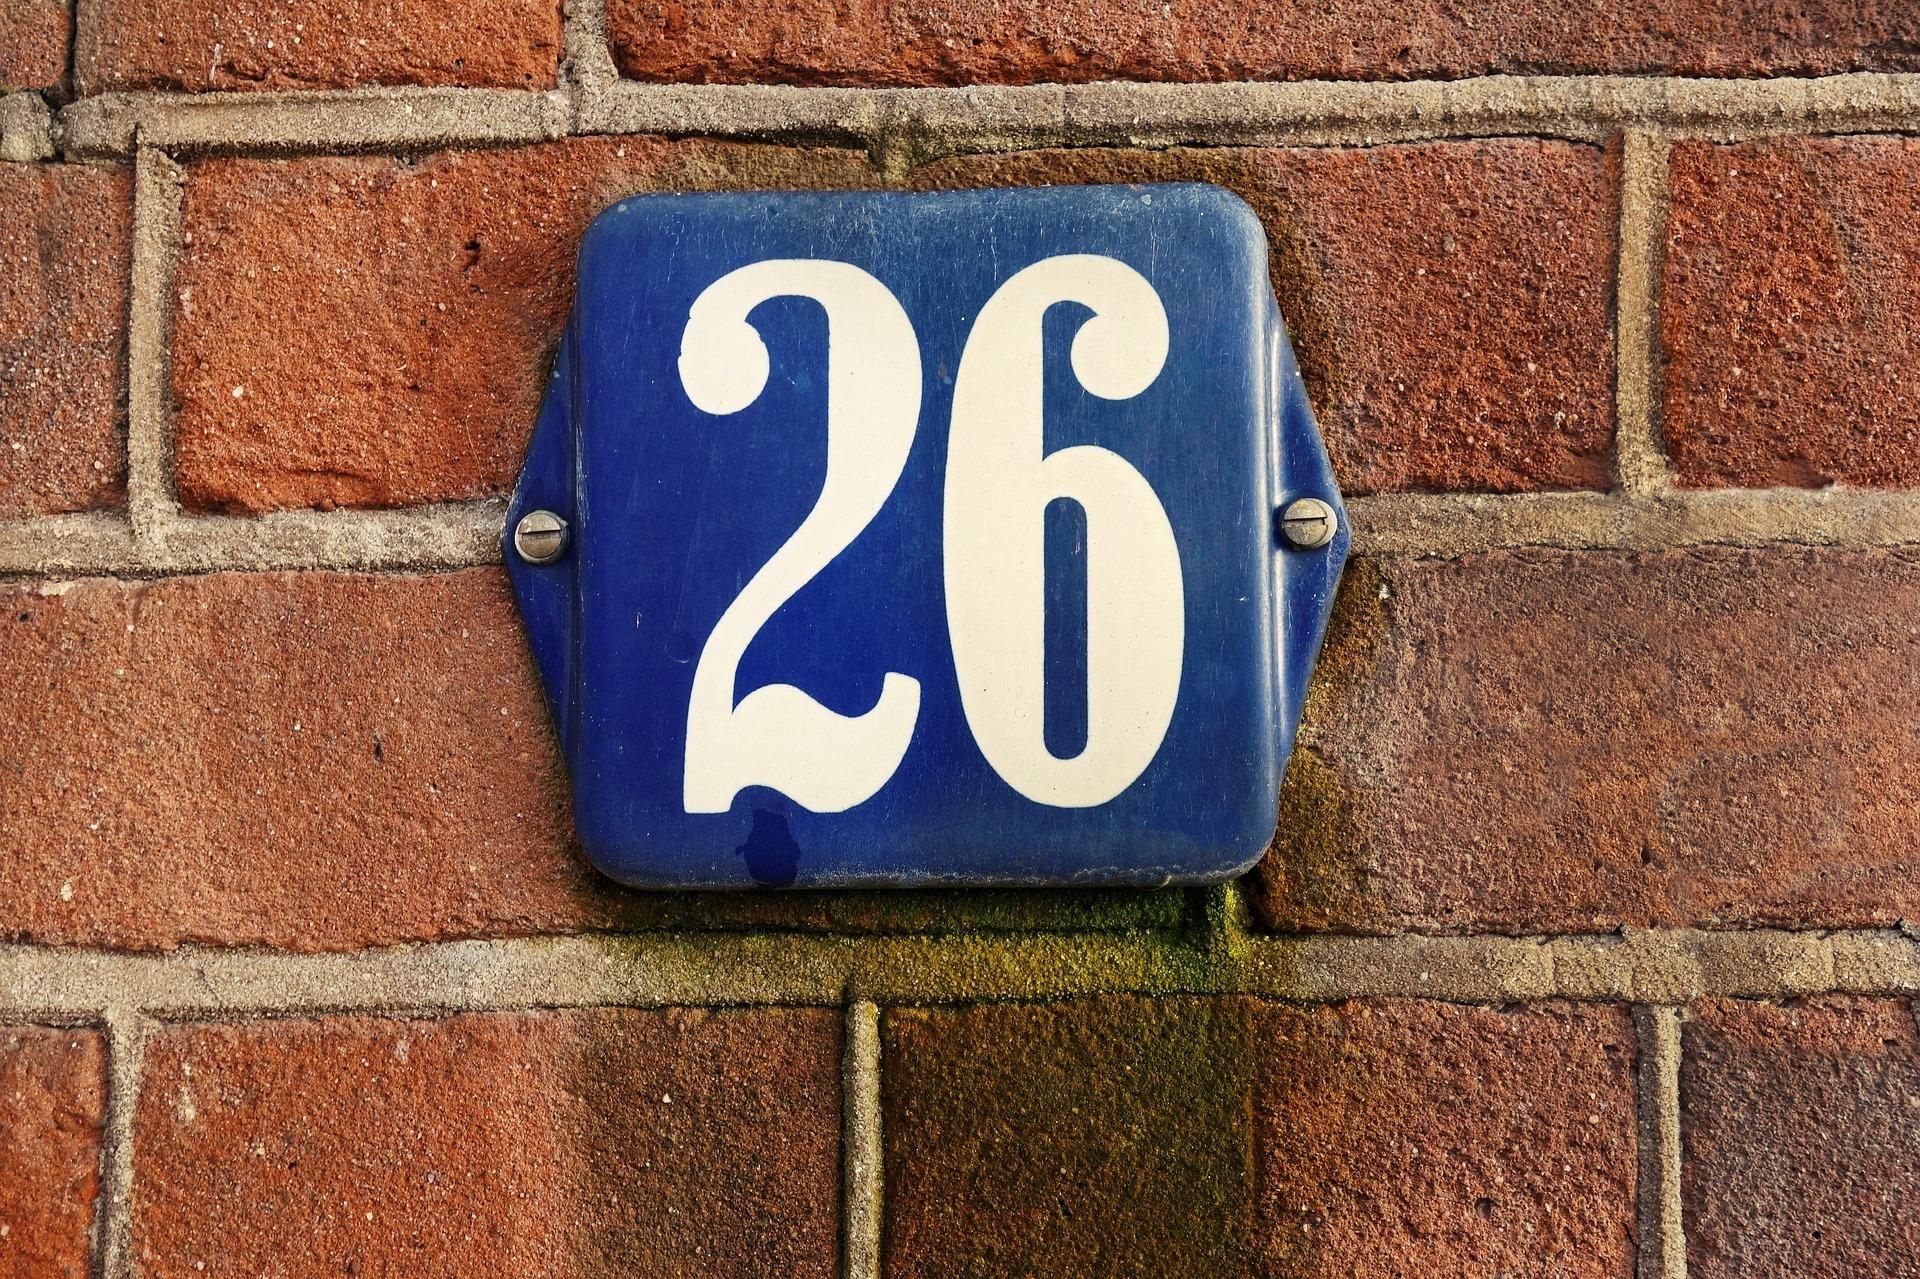 Baner: numer domu tabliczka